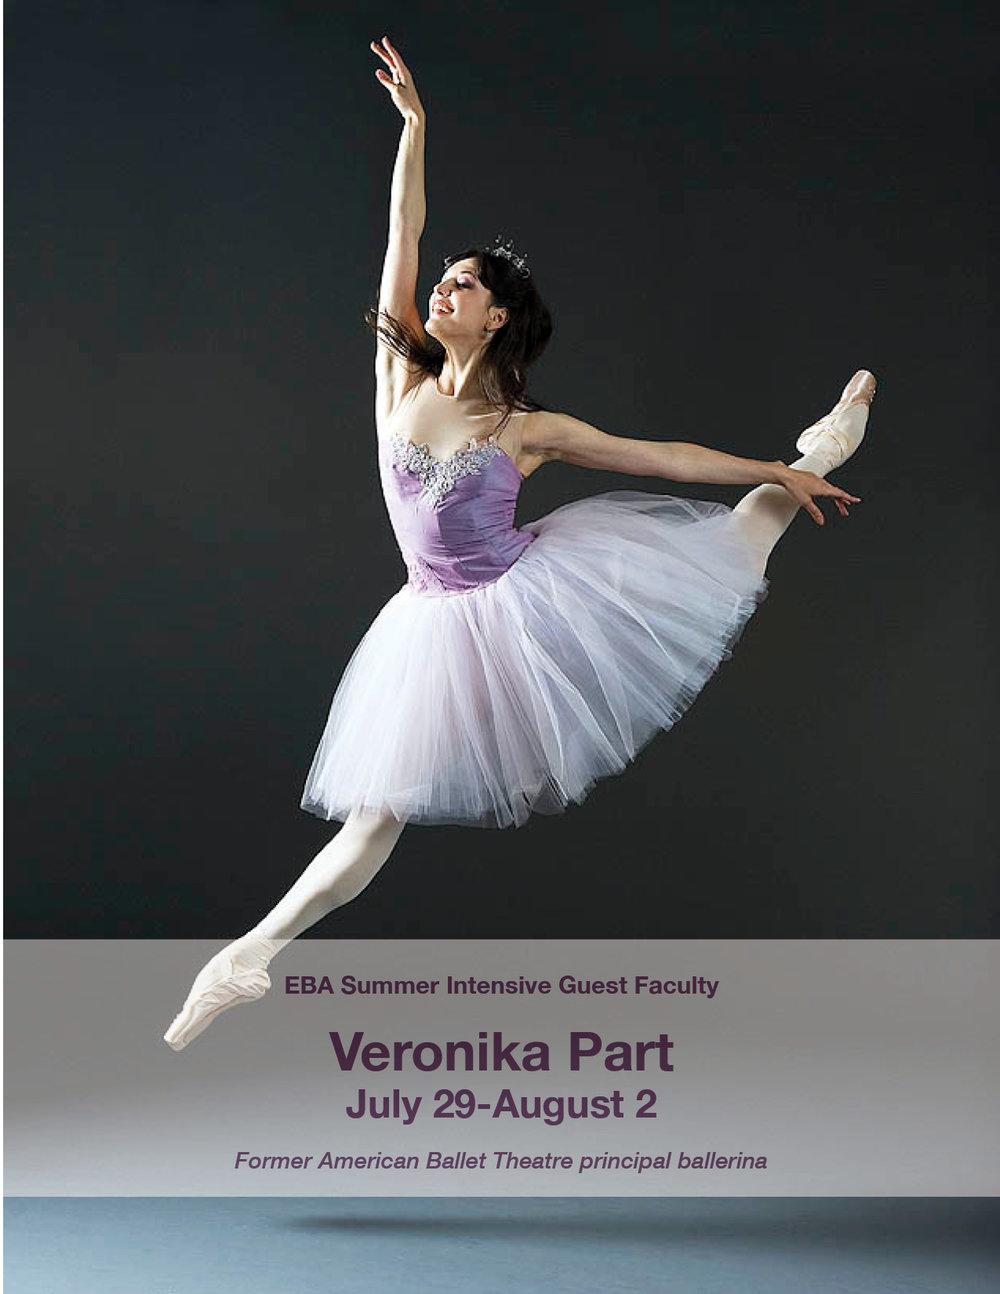 VeronikaPart2.jpg